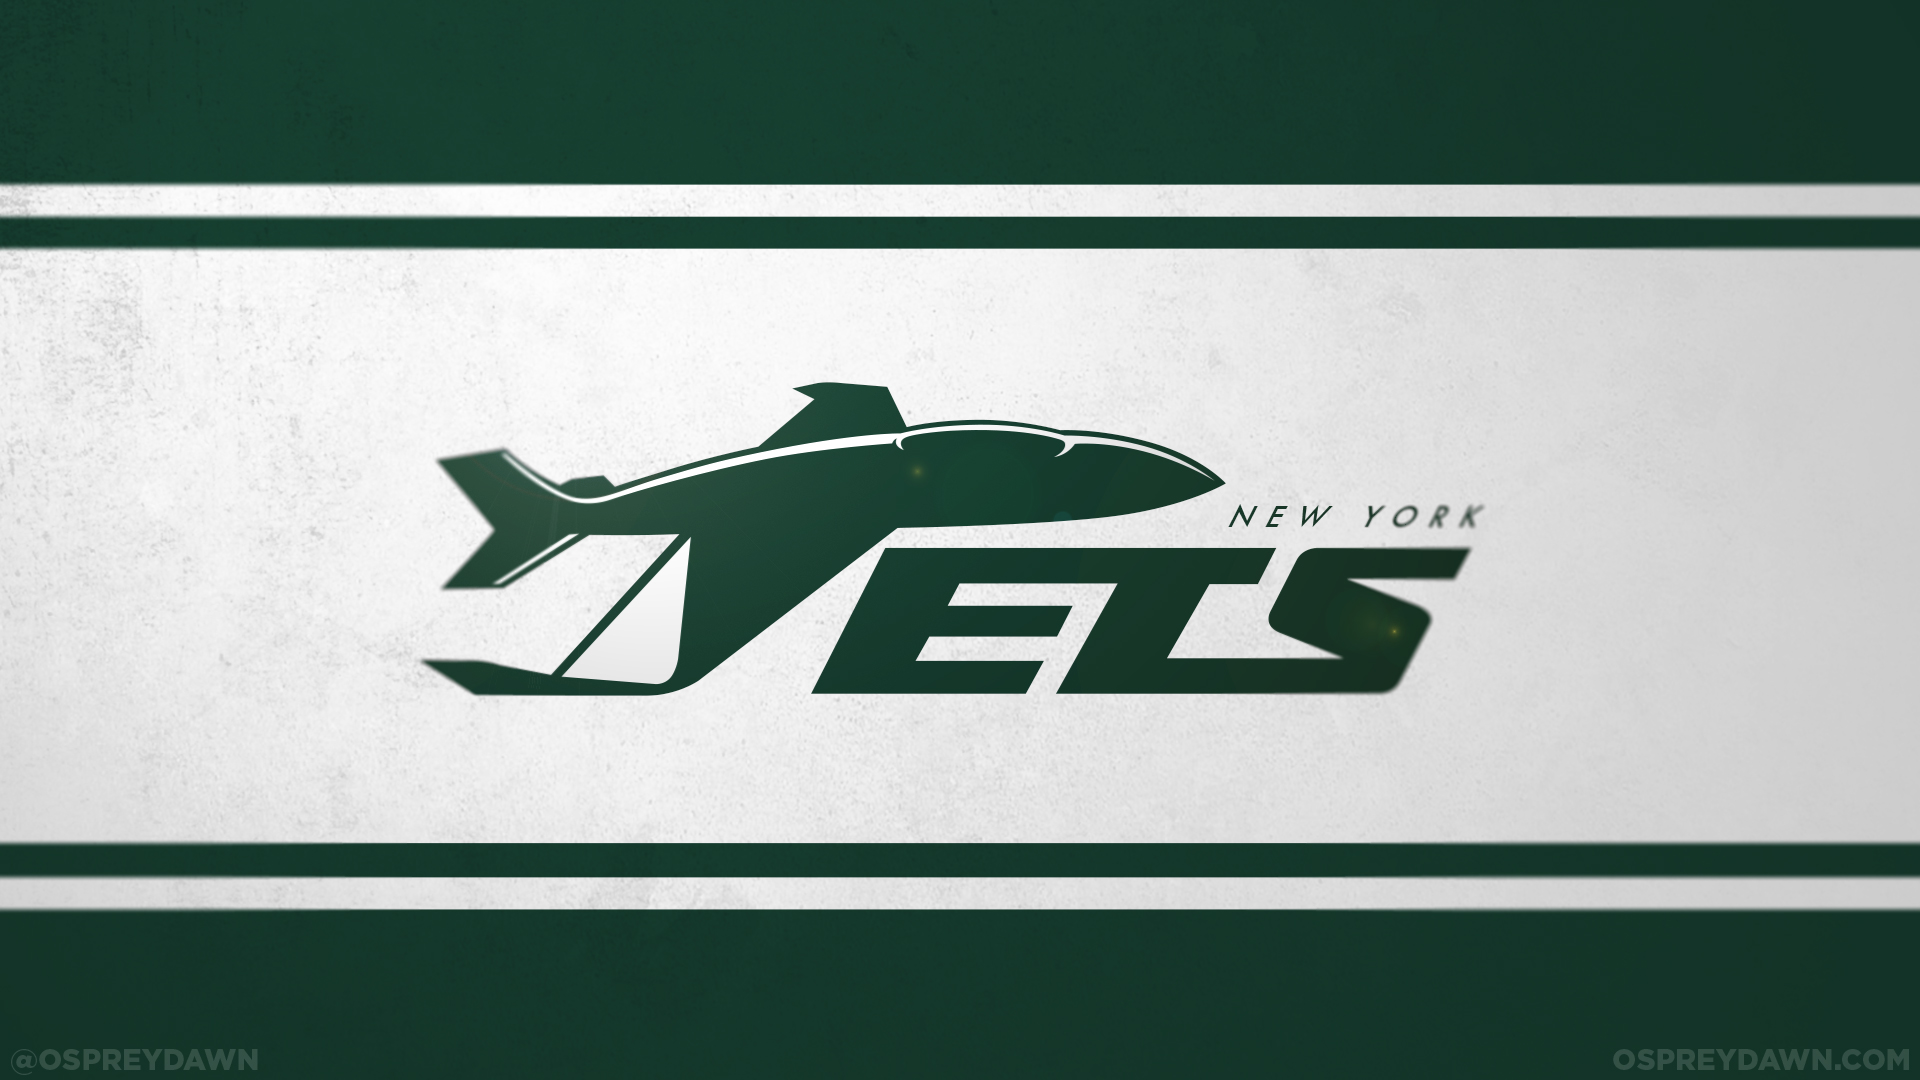 New York Jets Wallpaper 1920x1080 73375